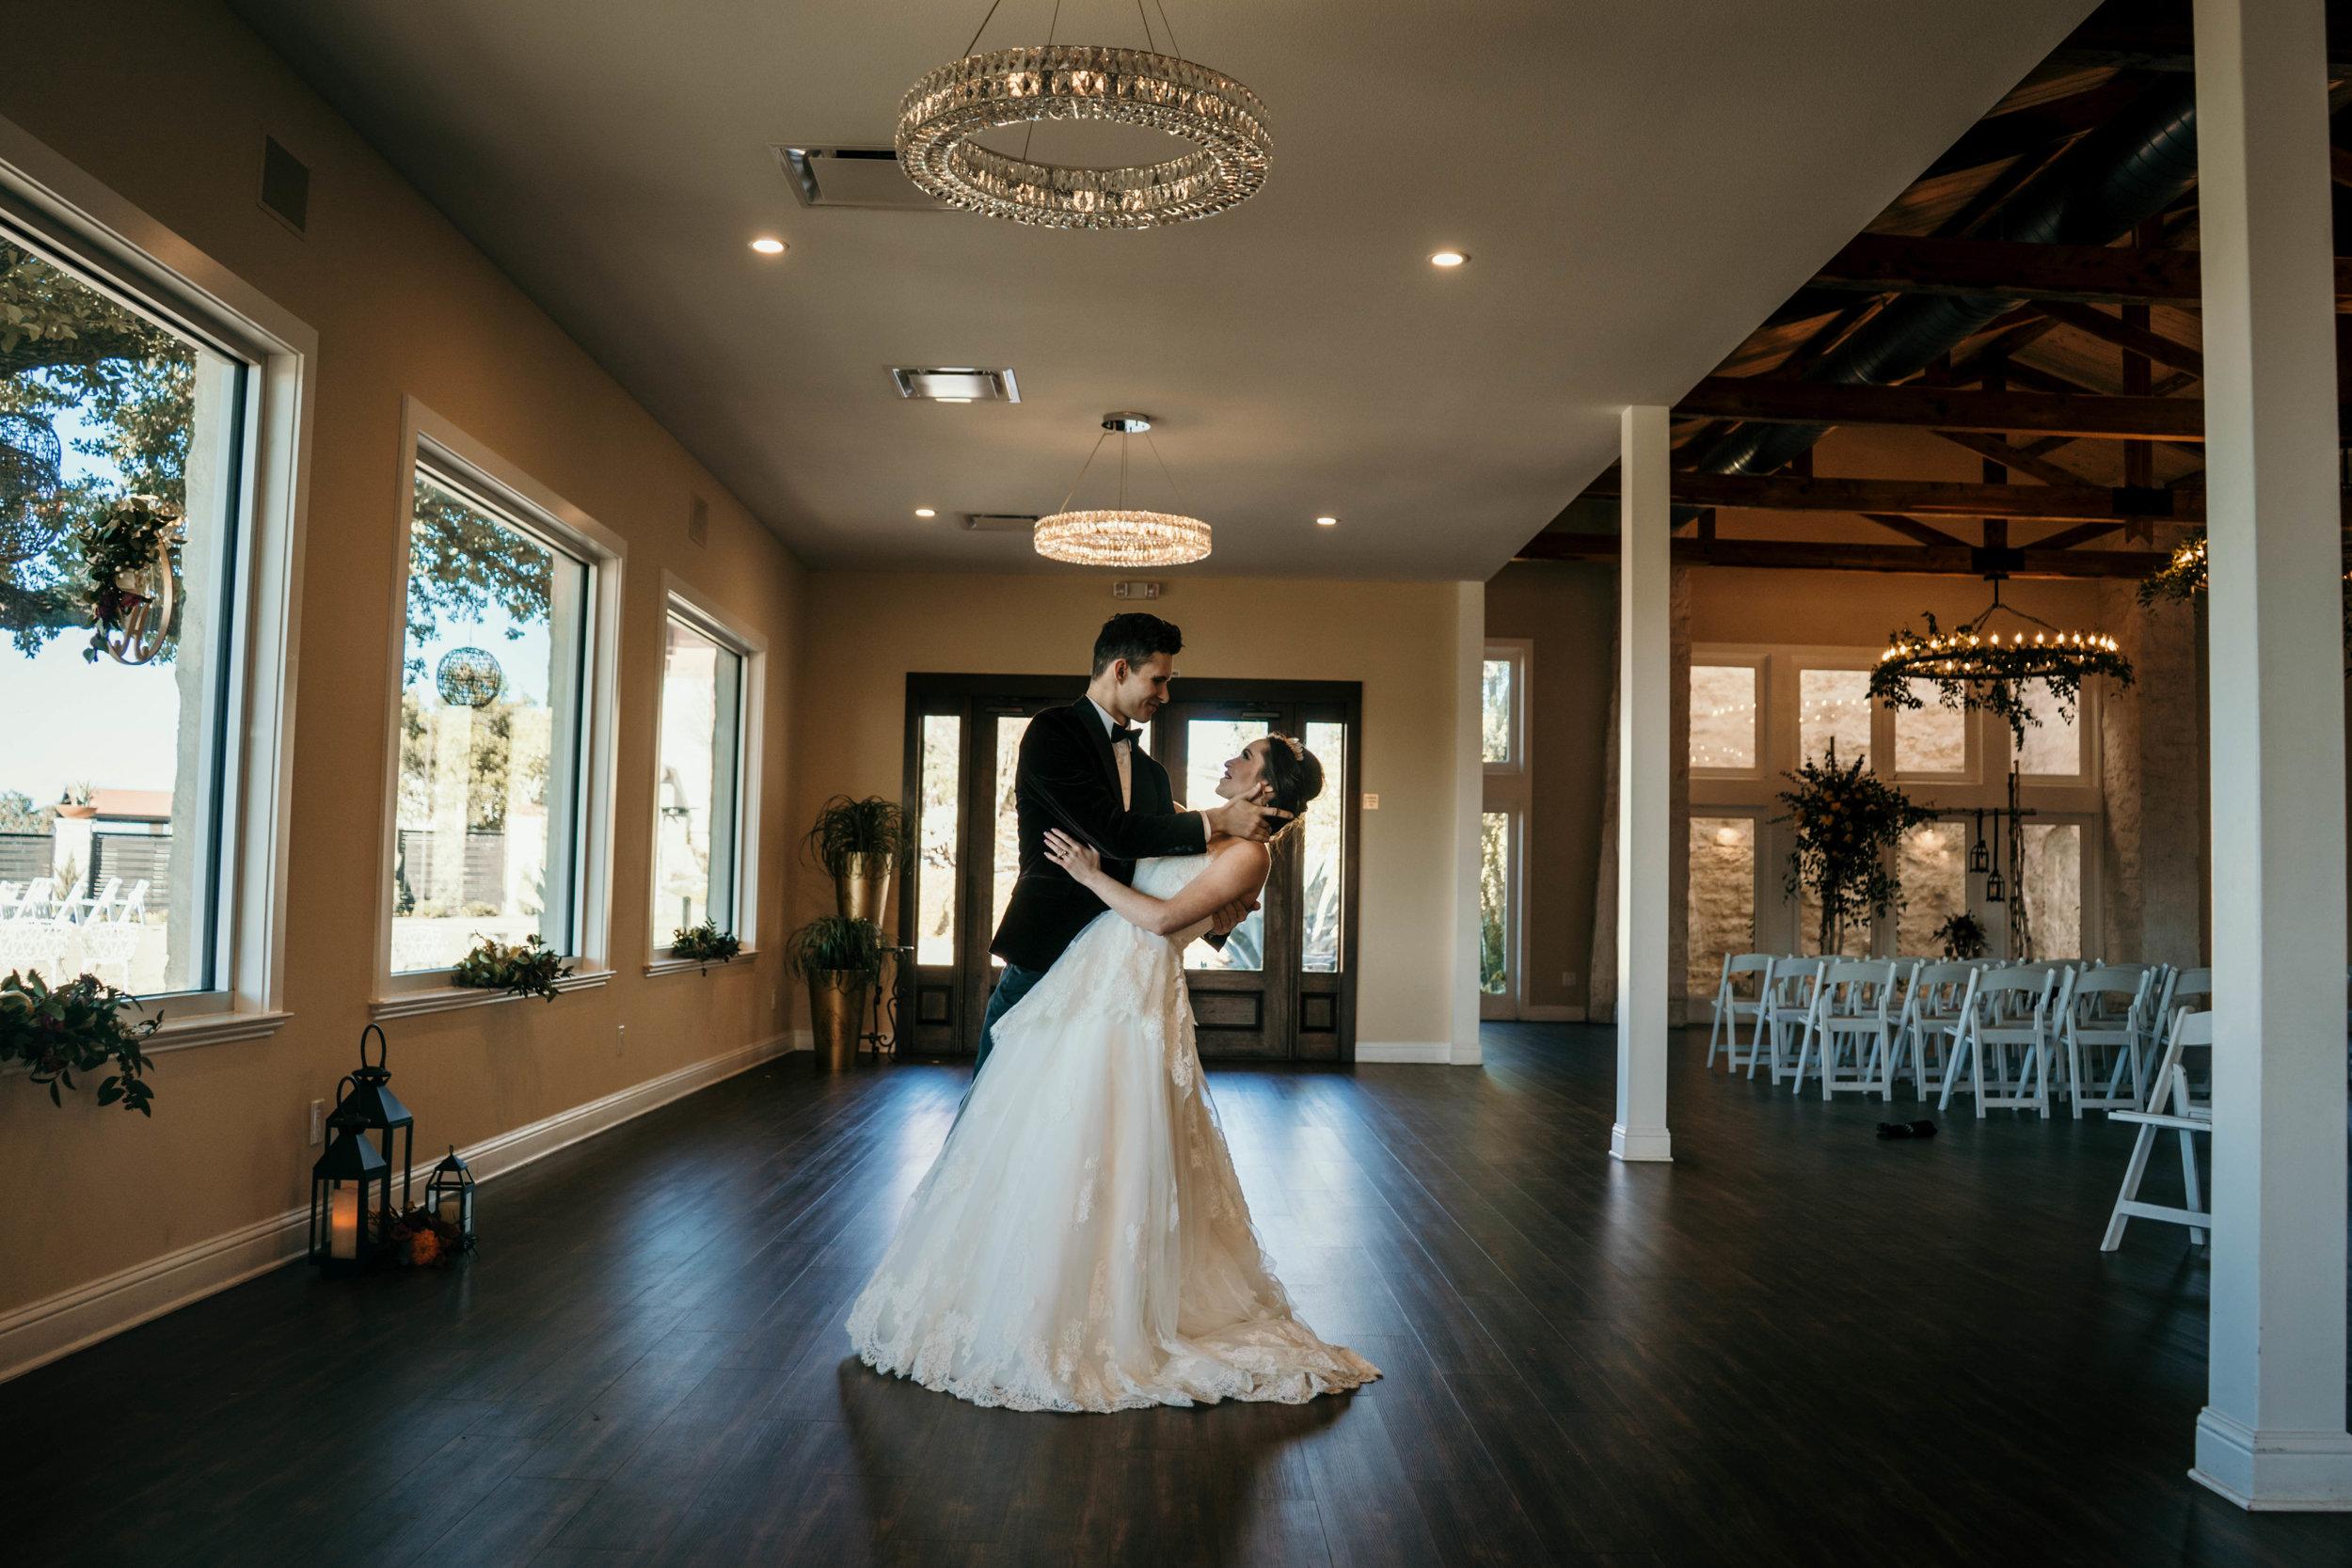 Austin Wedding Videographer - Dolls for Dolls (318 of 323).jpg